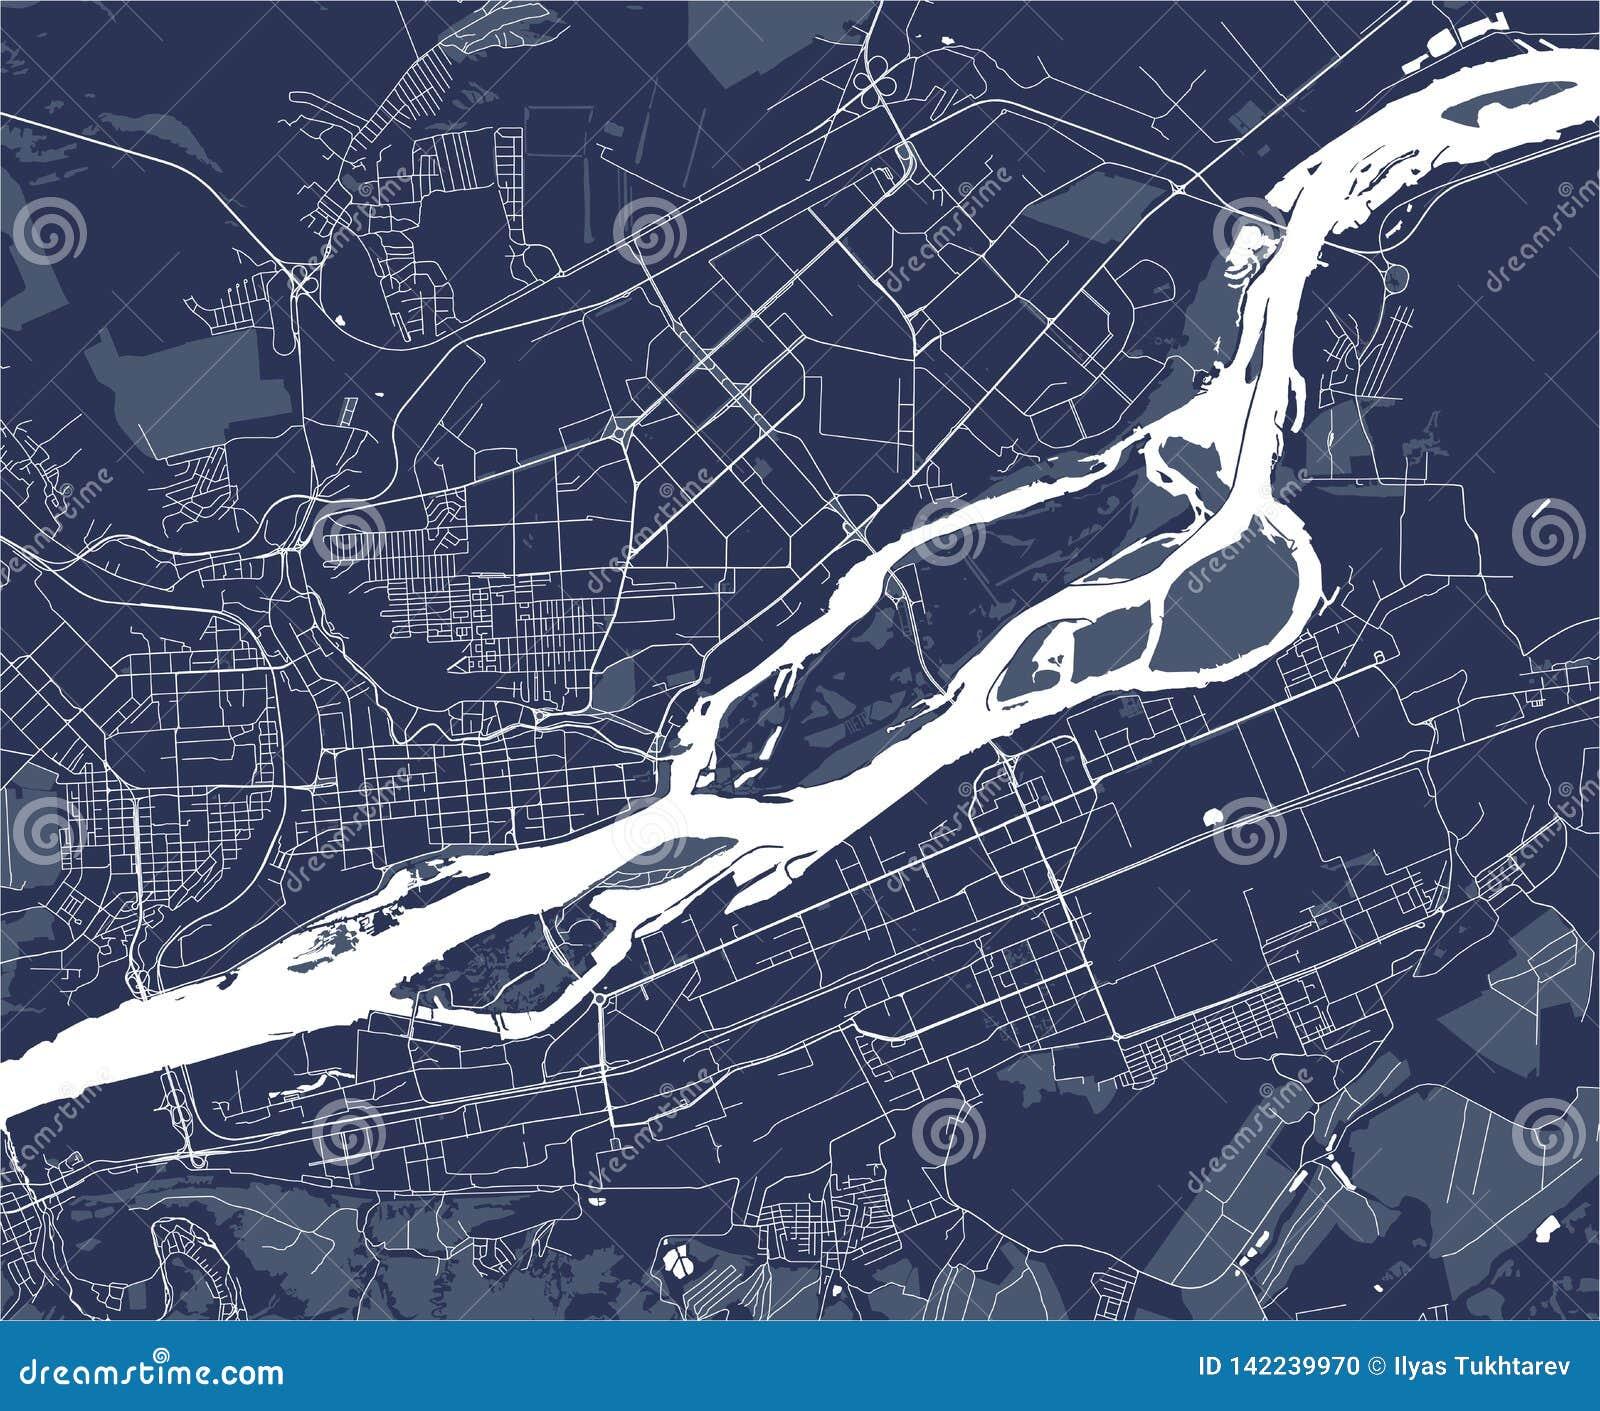 Map of the city of Krasnoyarsk, Russia